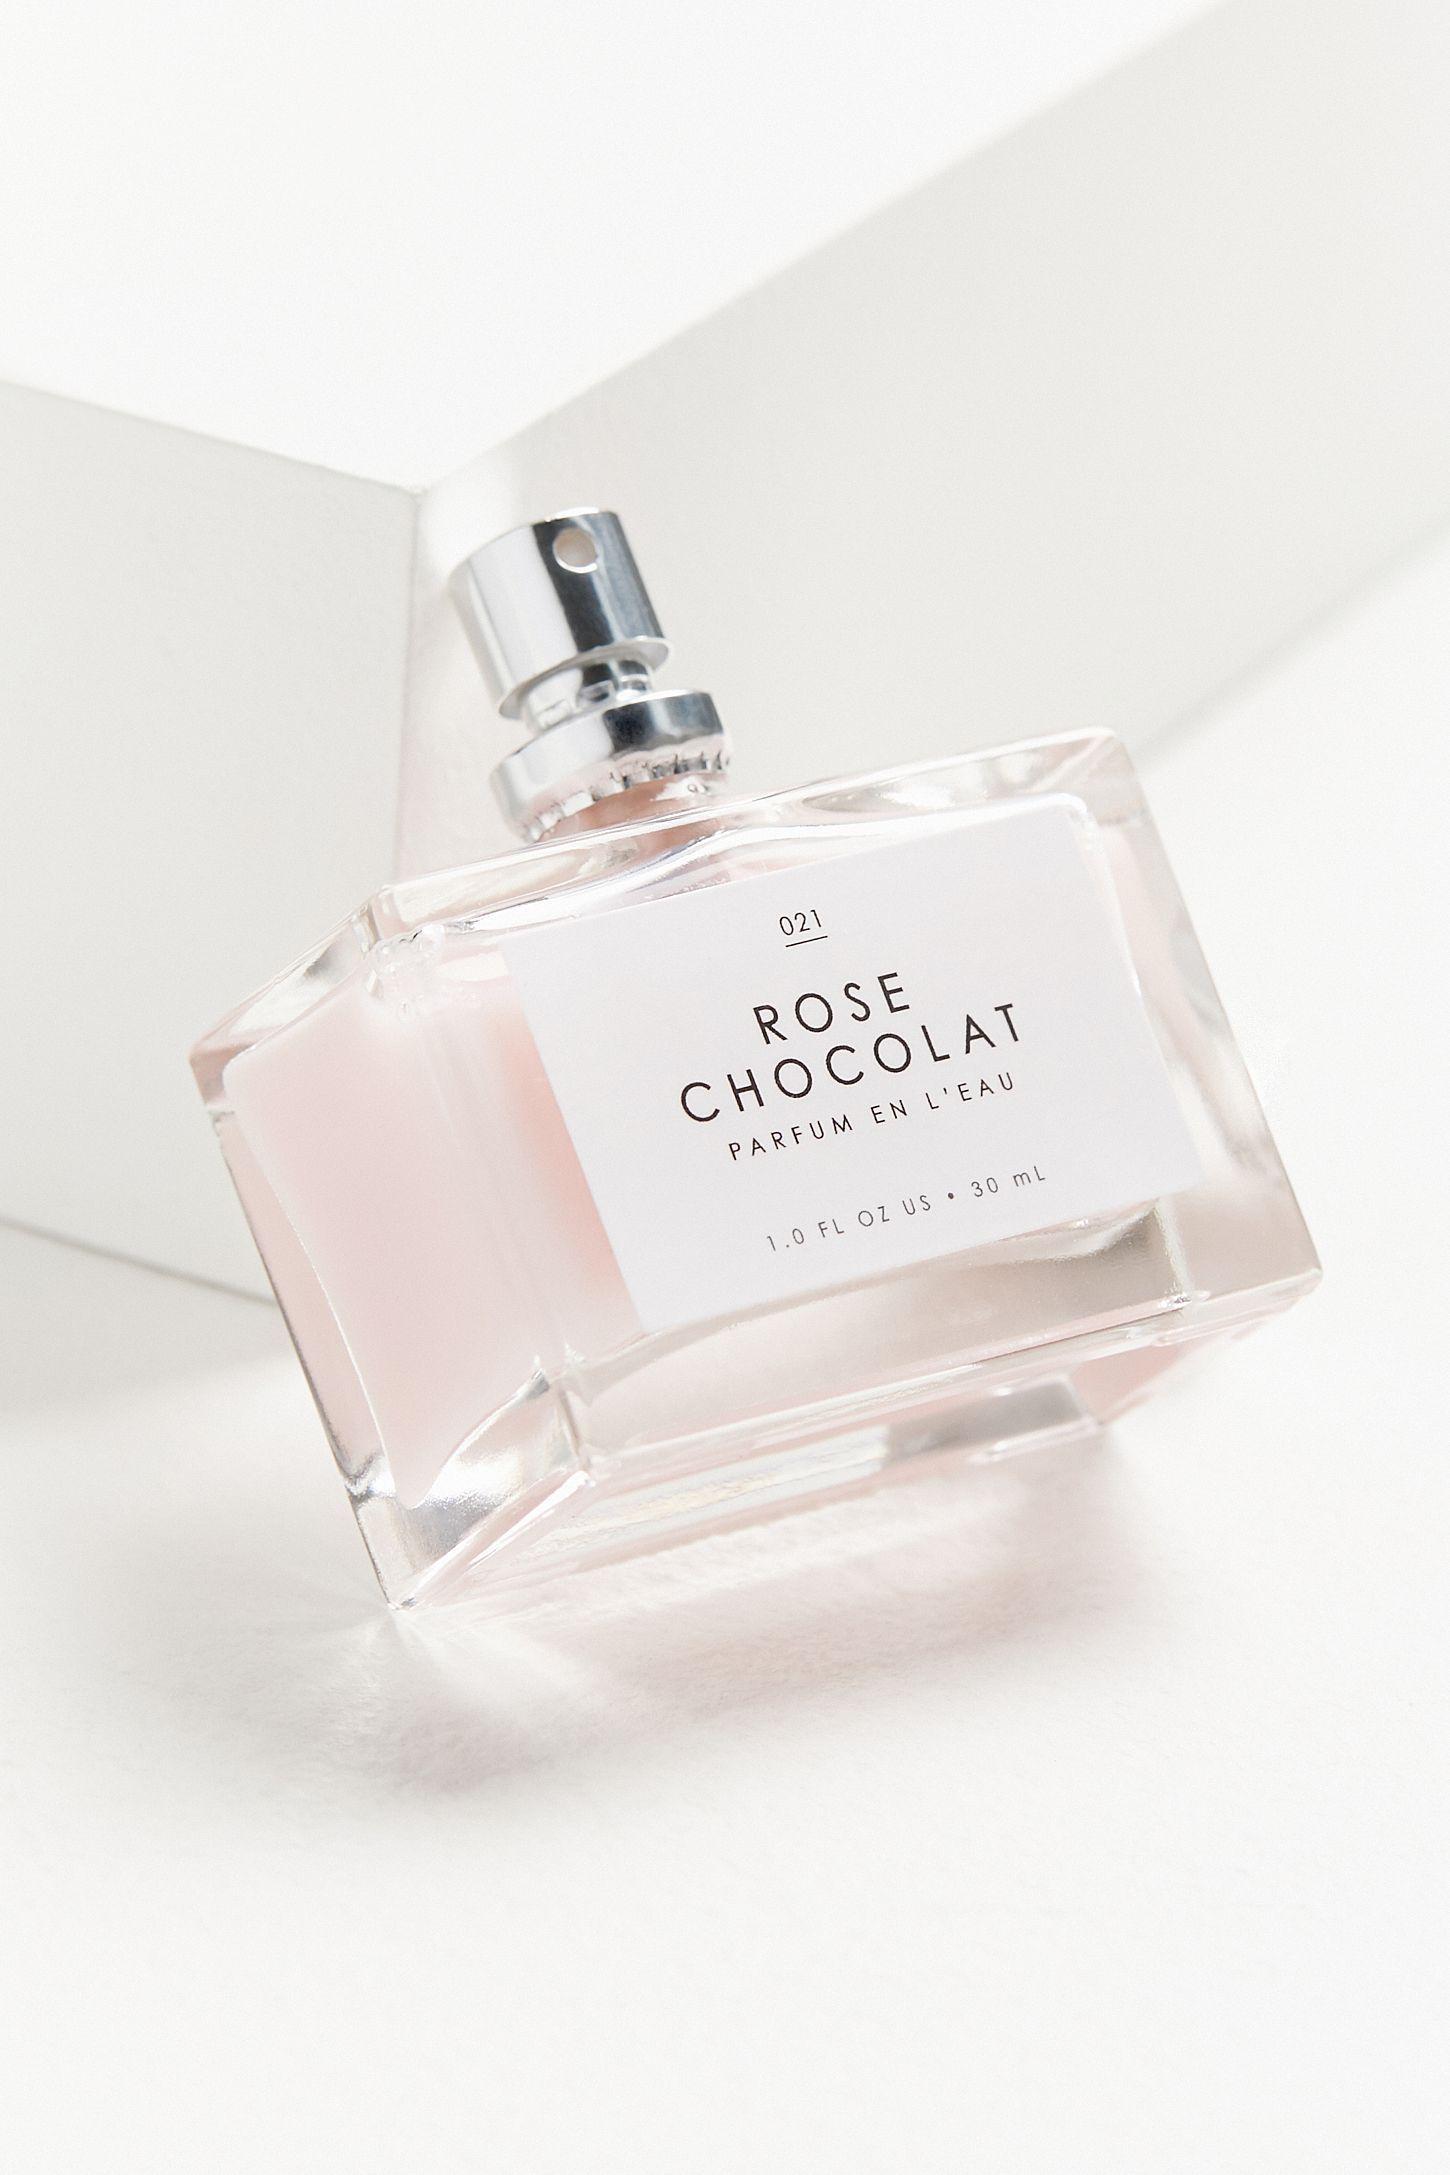 Gourmand Eau De Parfum Fragrance Fragrance Perfume Ginger Flower